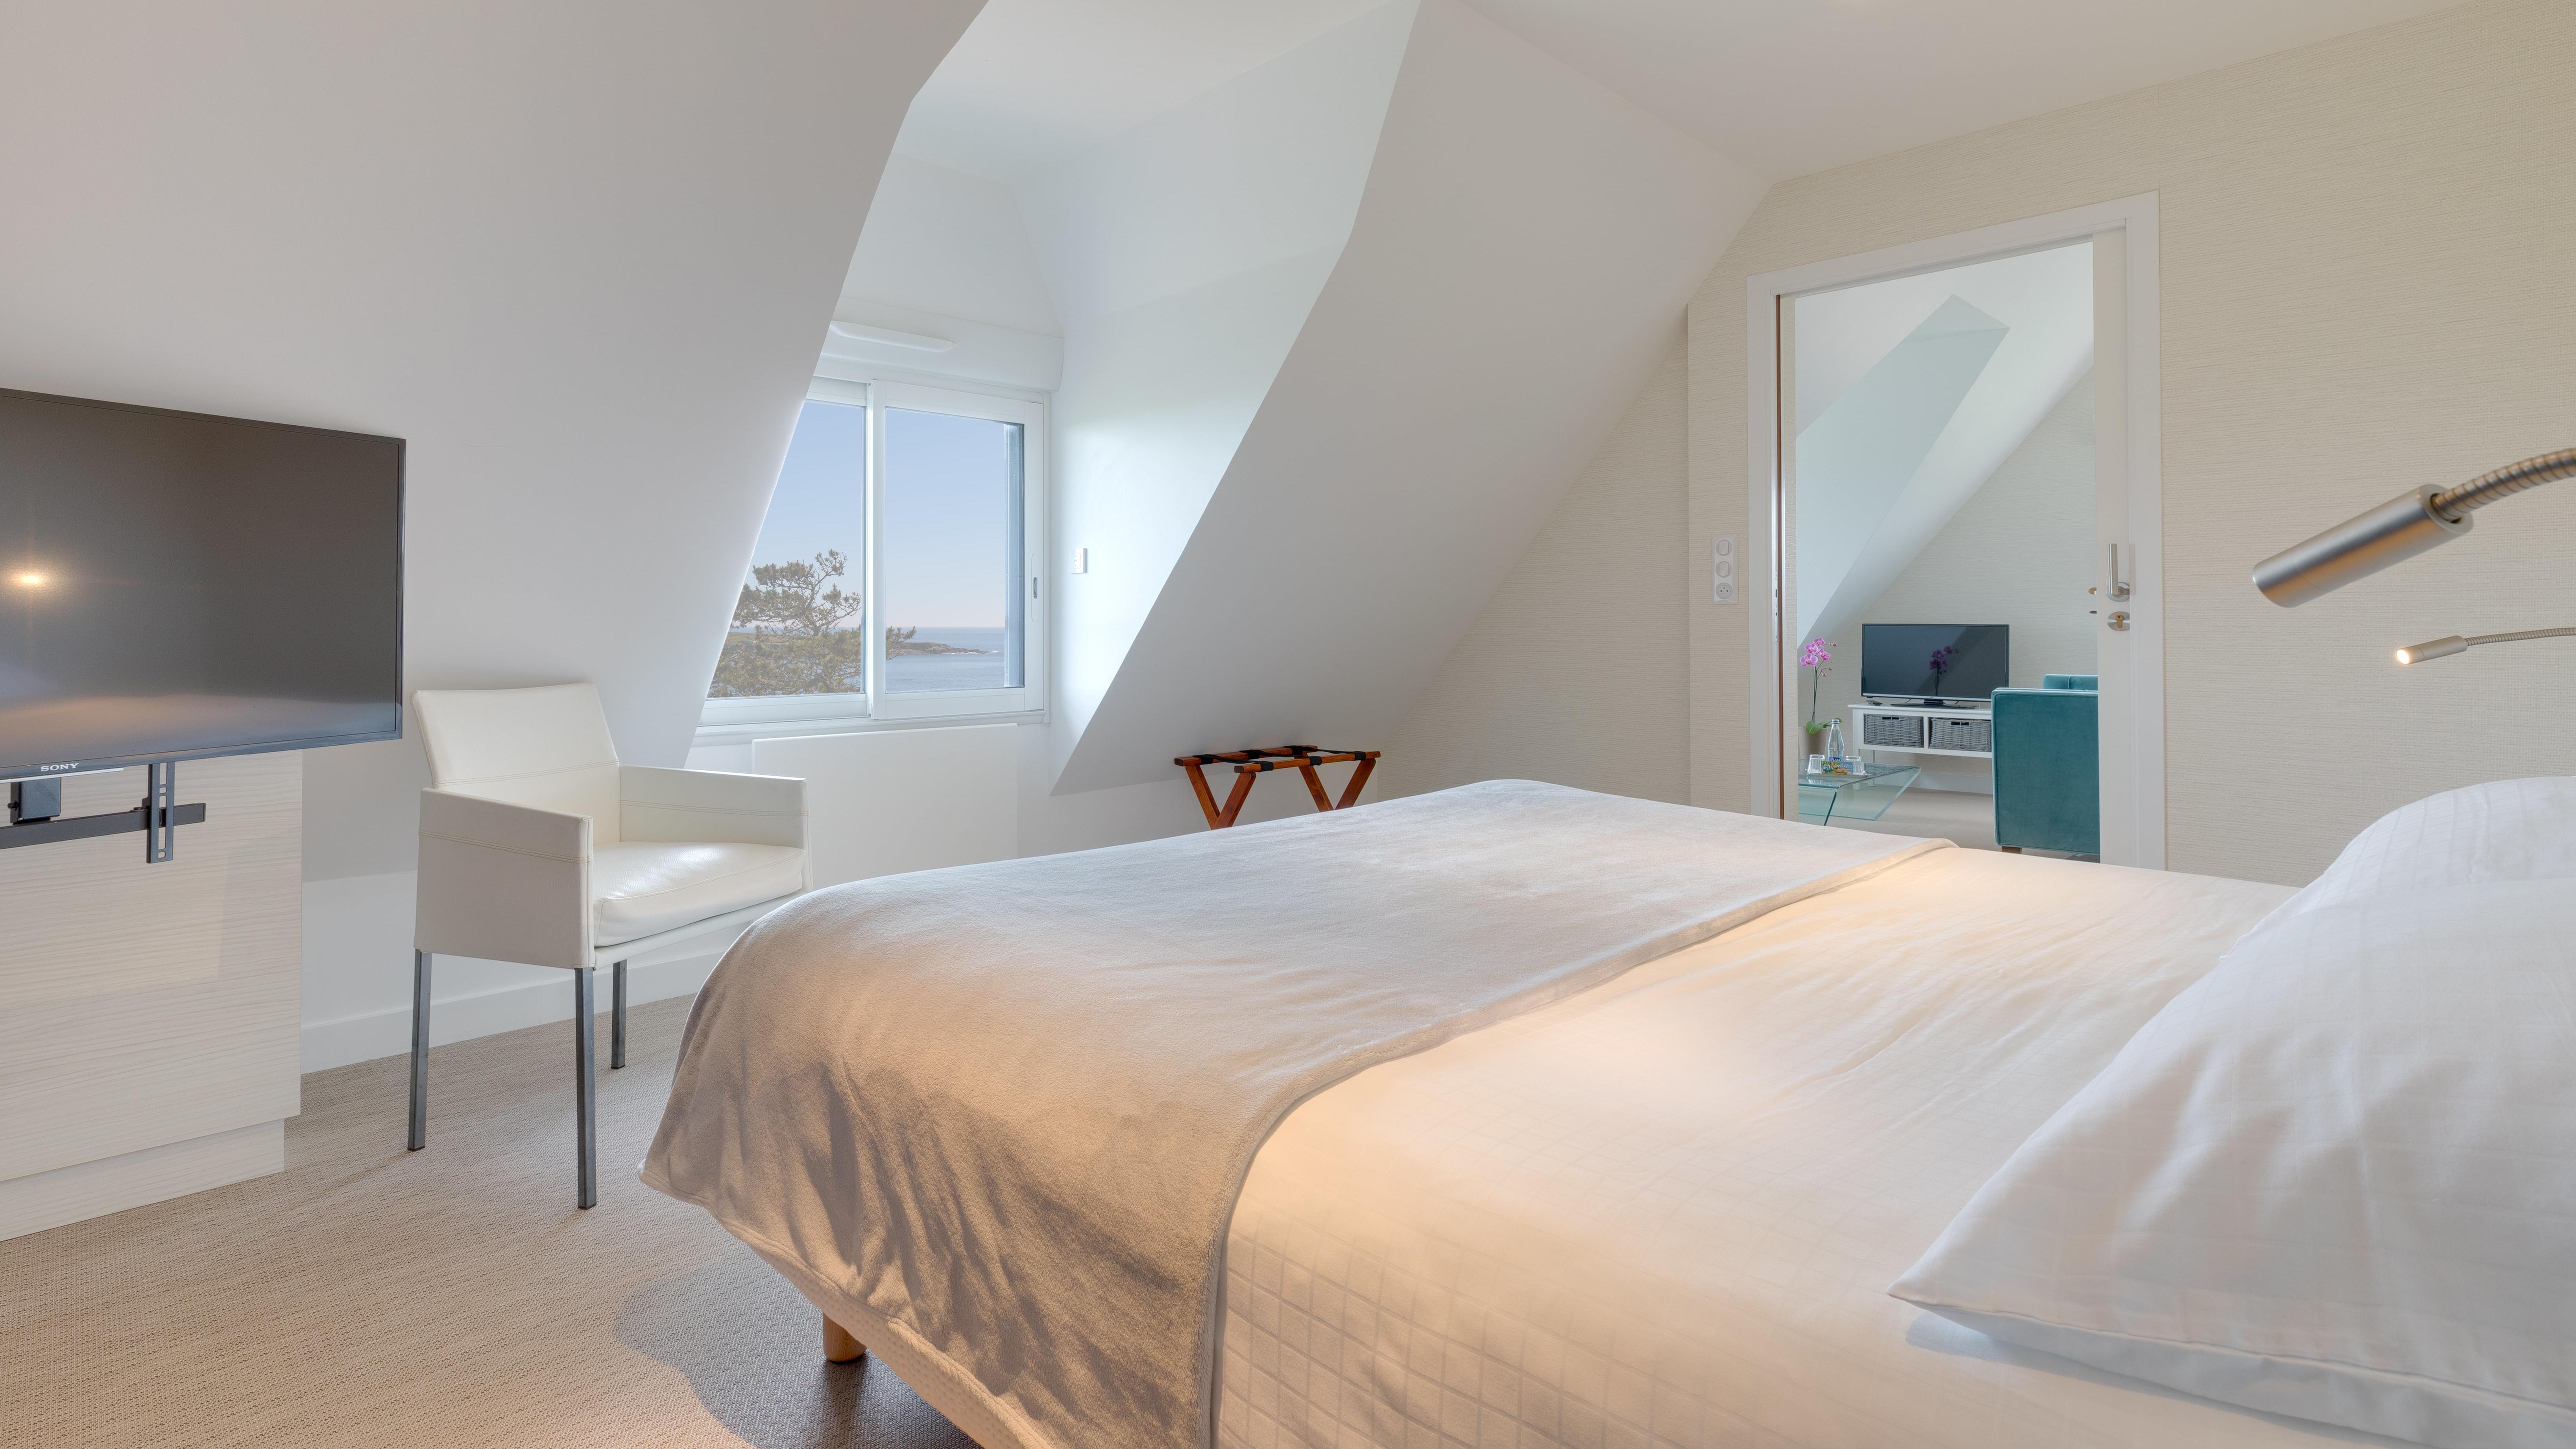 Panoramic Room at Ar Men Du Hotel in Névez, Brittany